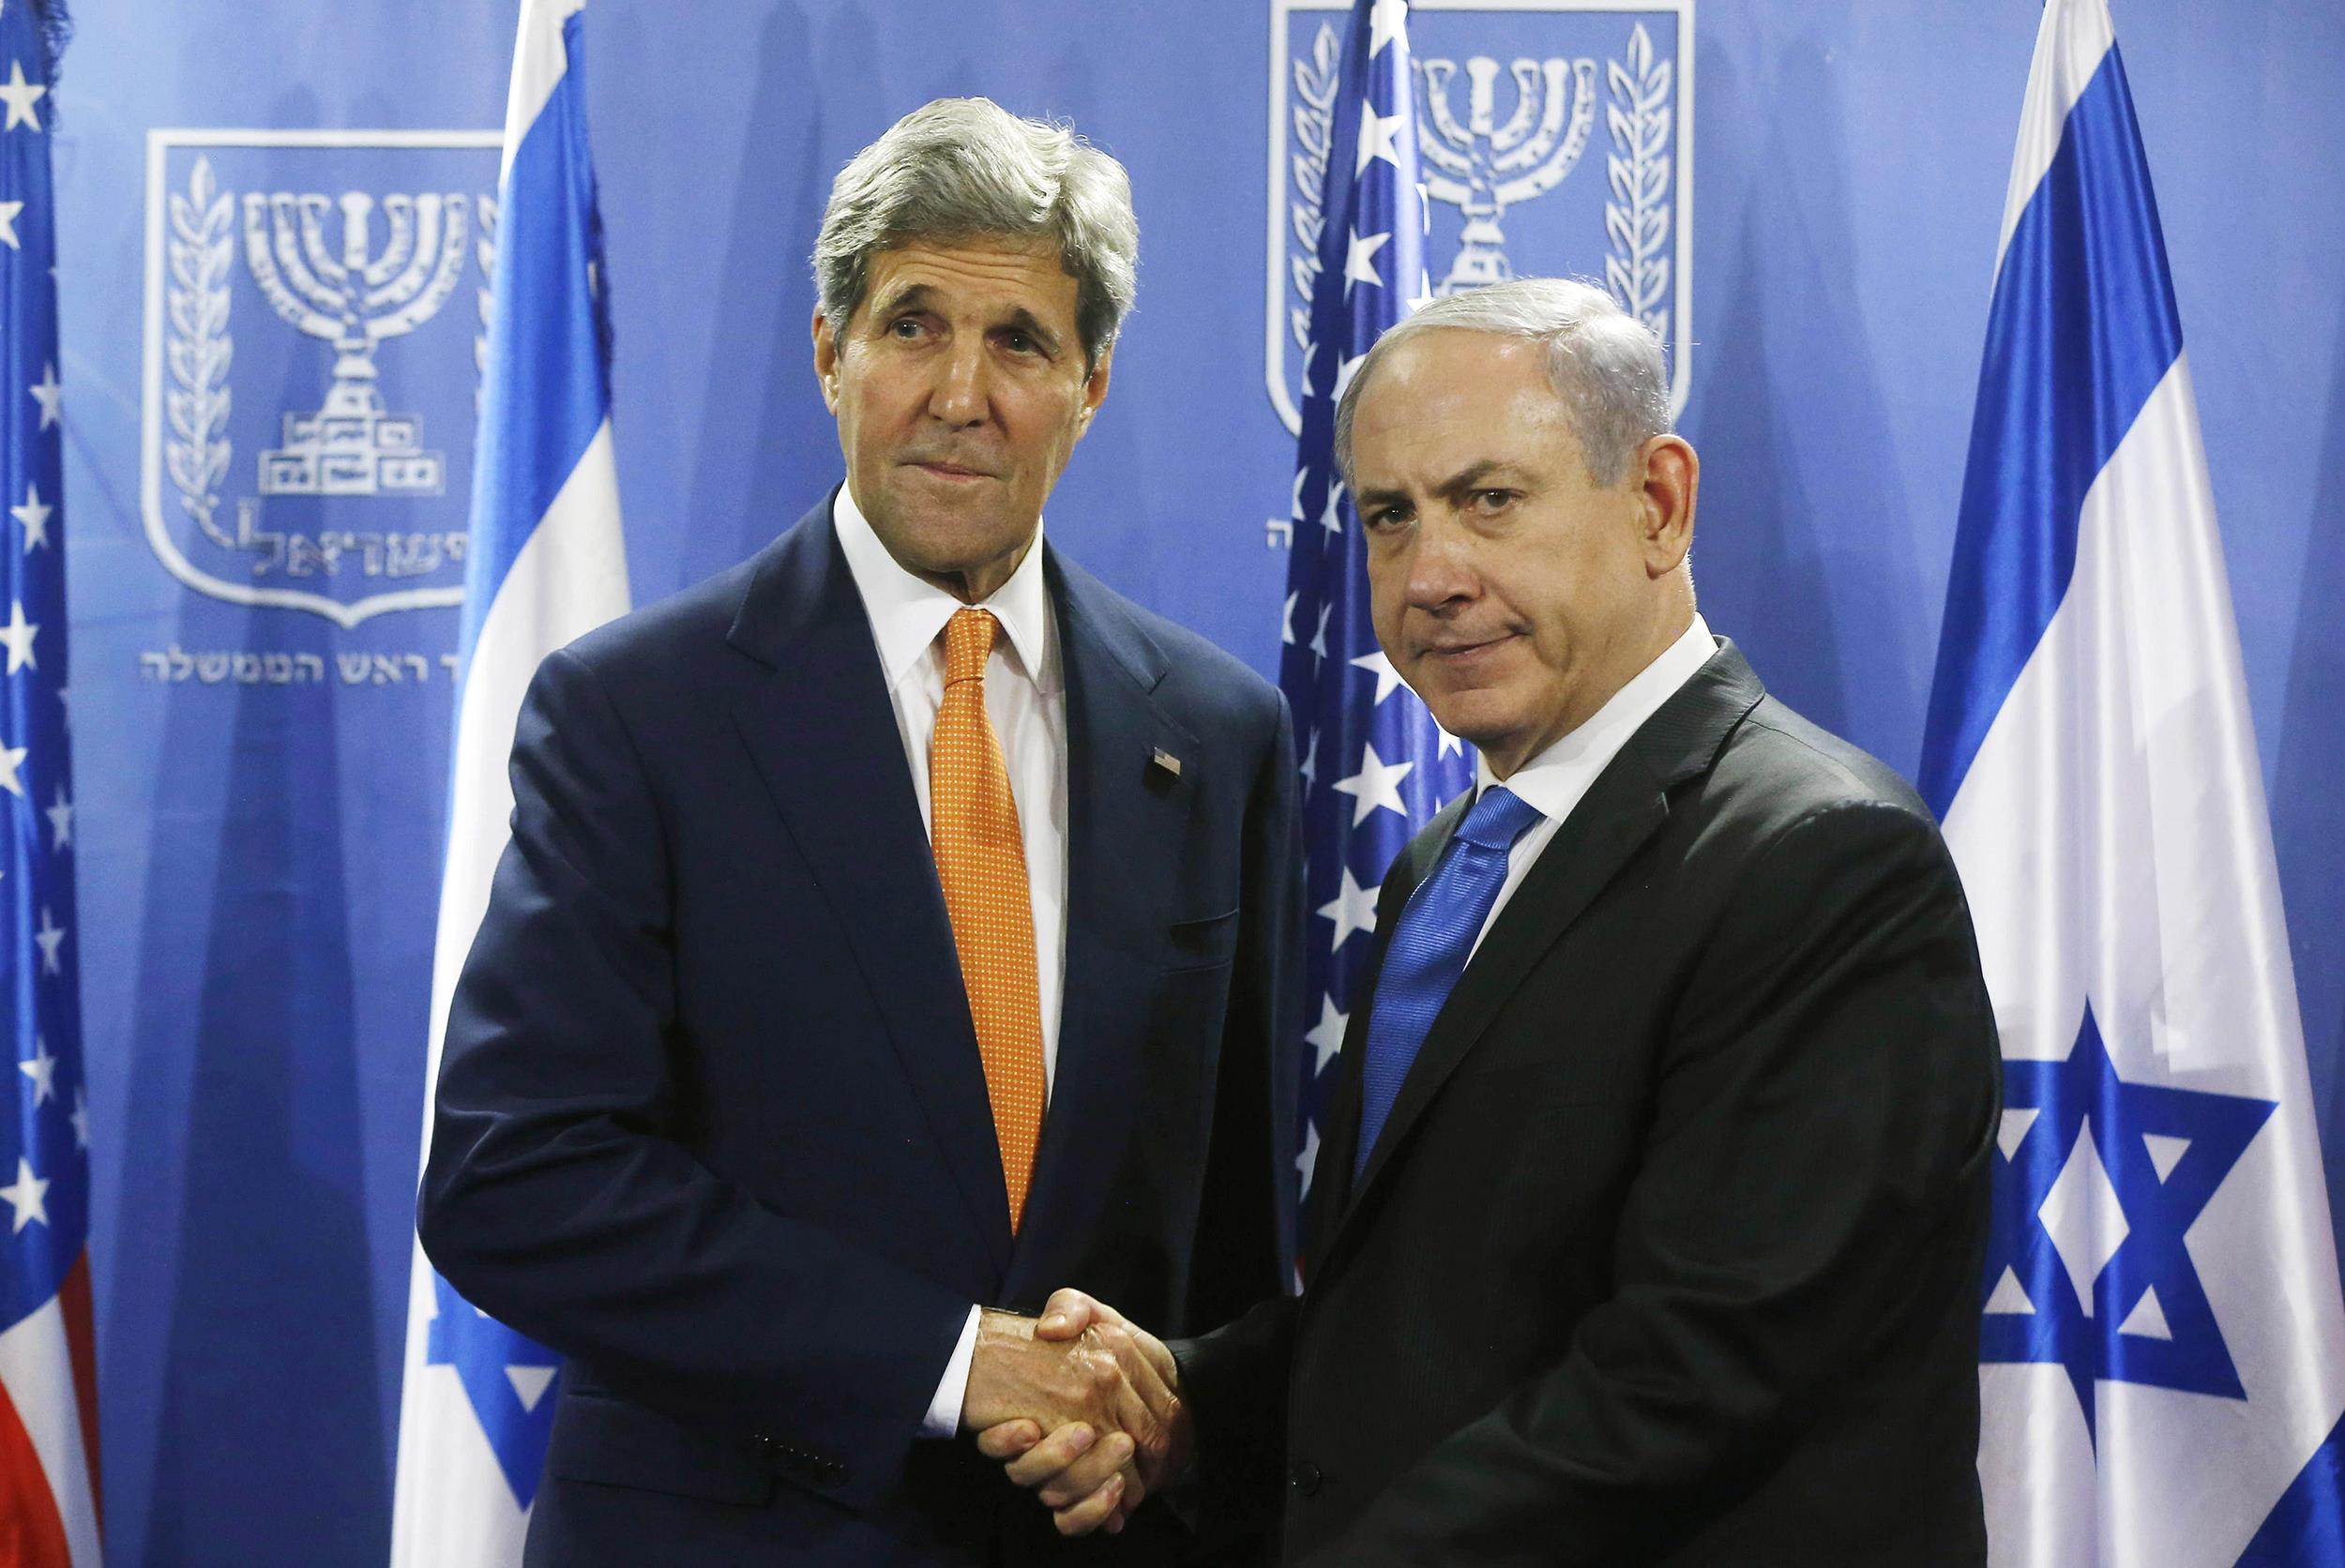 Image: U.S. Secretary of State John Kerry shakes hands with Israeli Prime Minister Benjamin Netanyahu in Tel Aviv